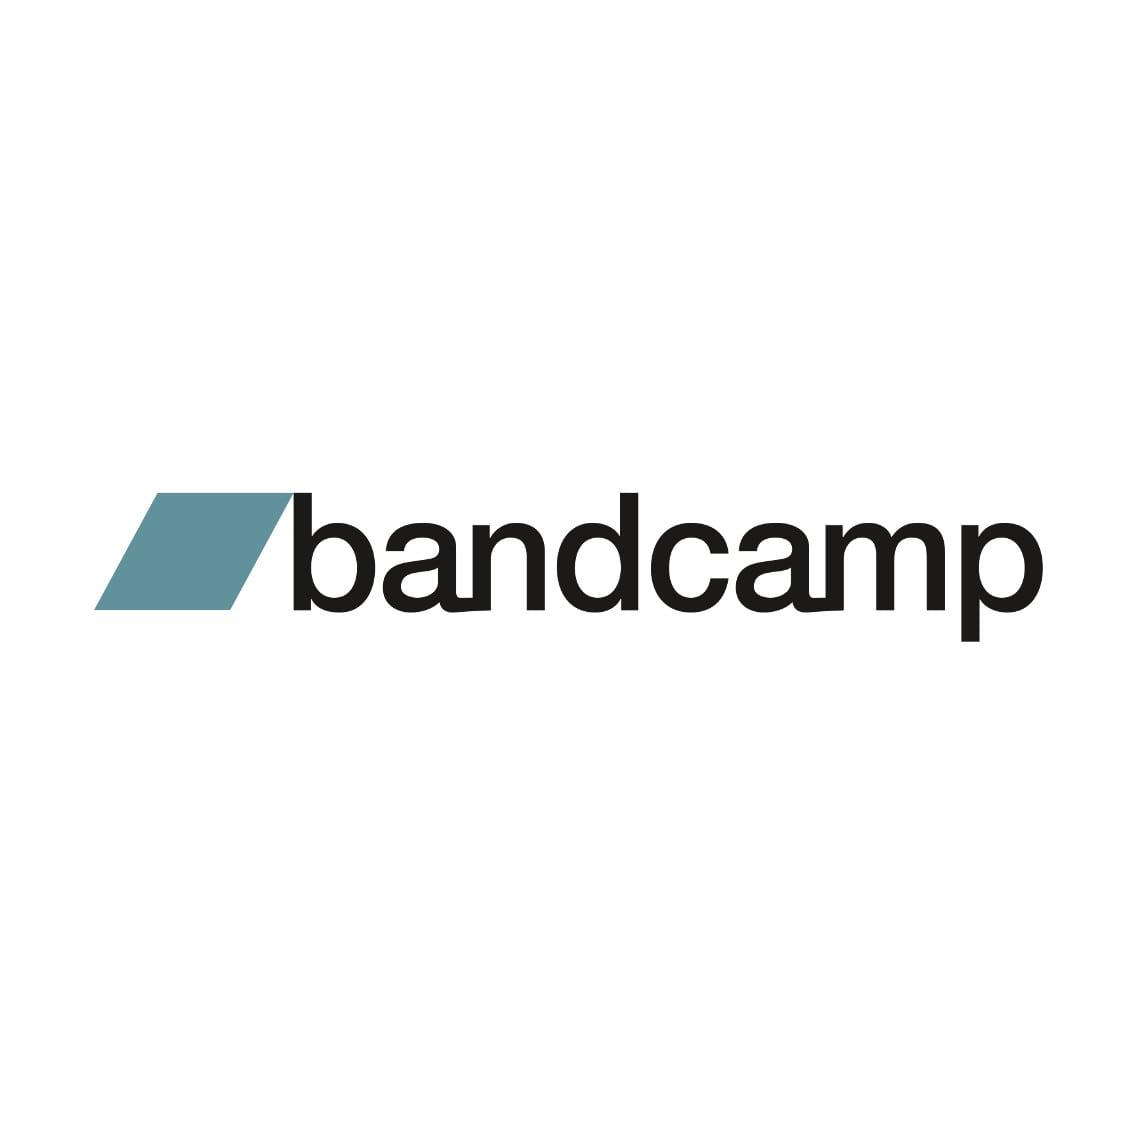 Artoffact Records launches massive Bandcamp merch sale - check it out